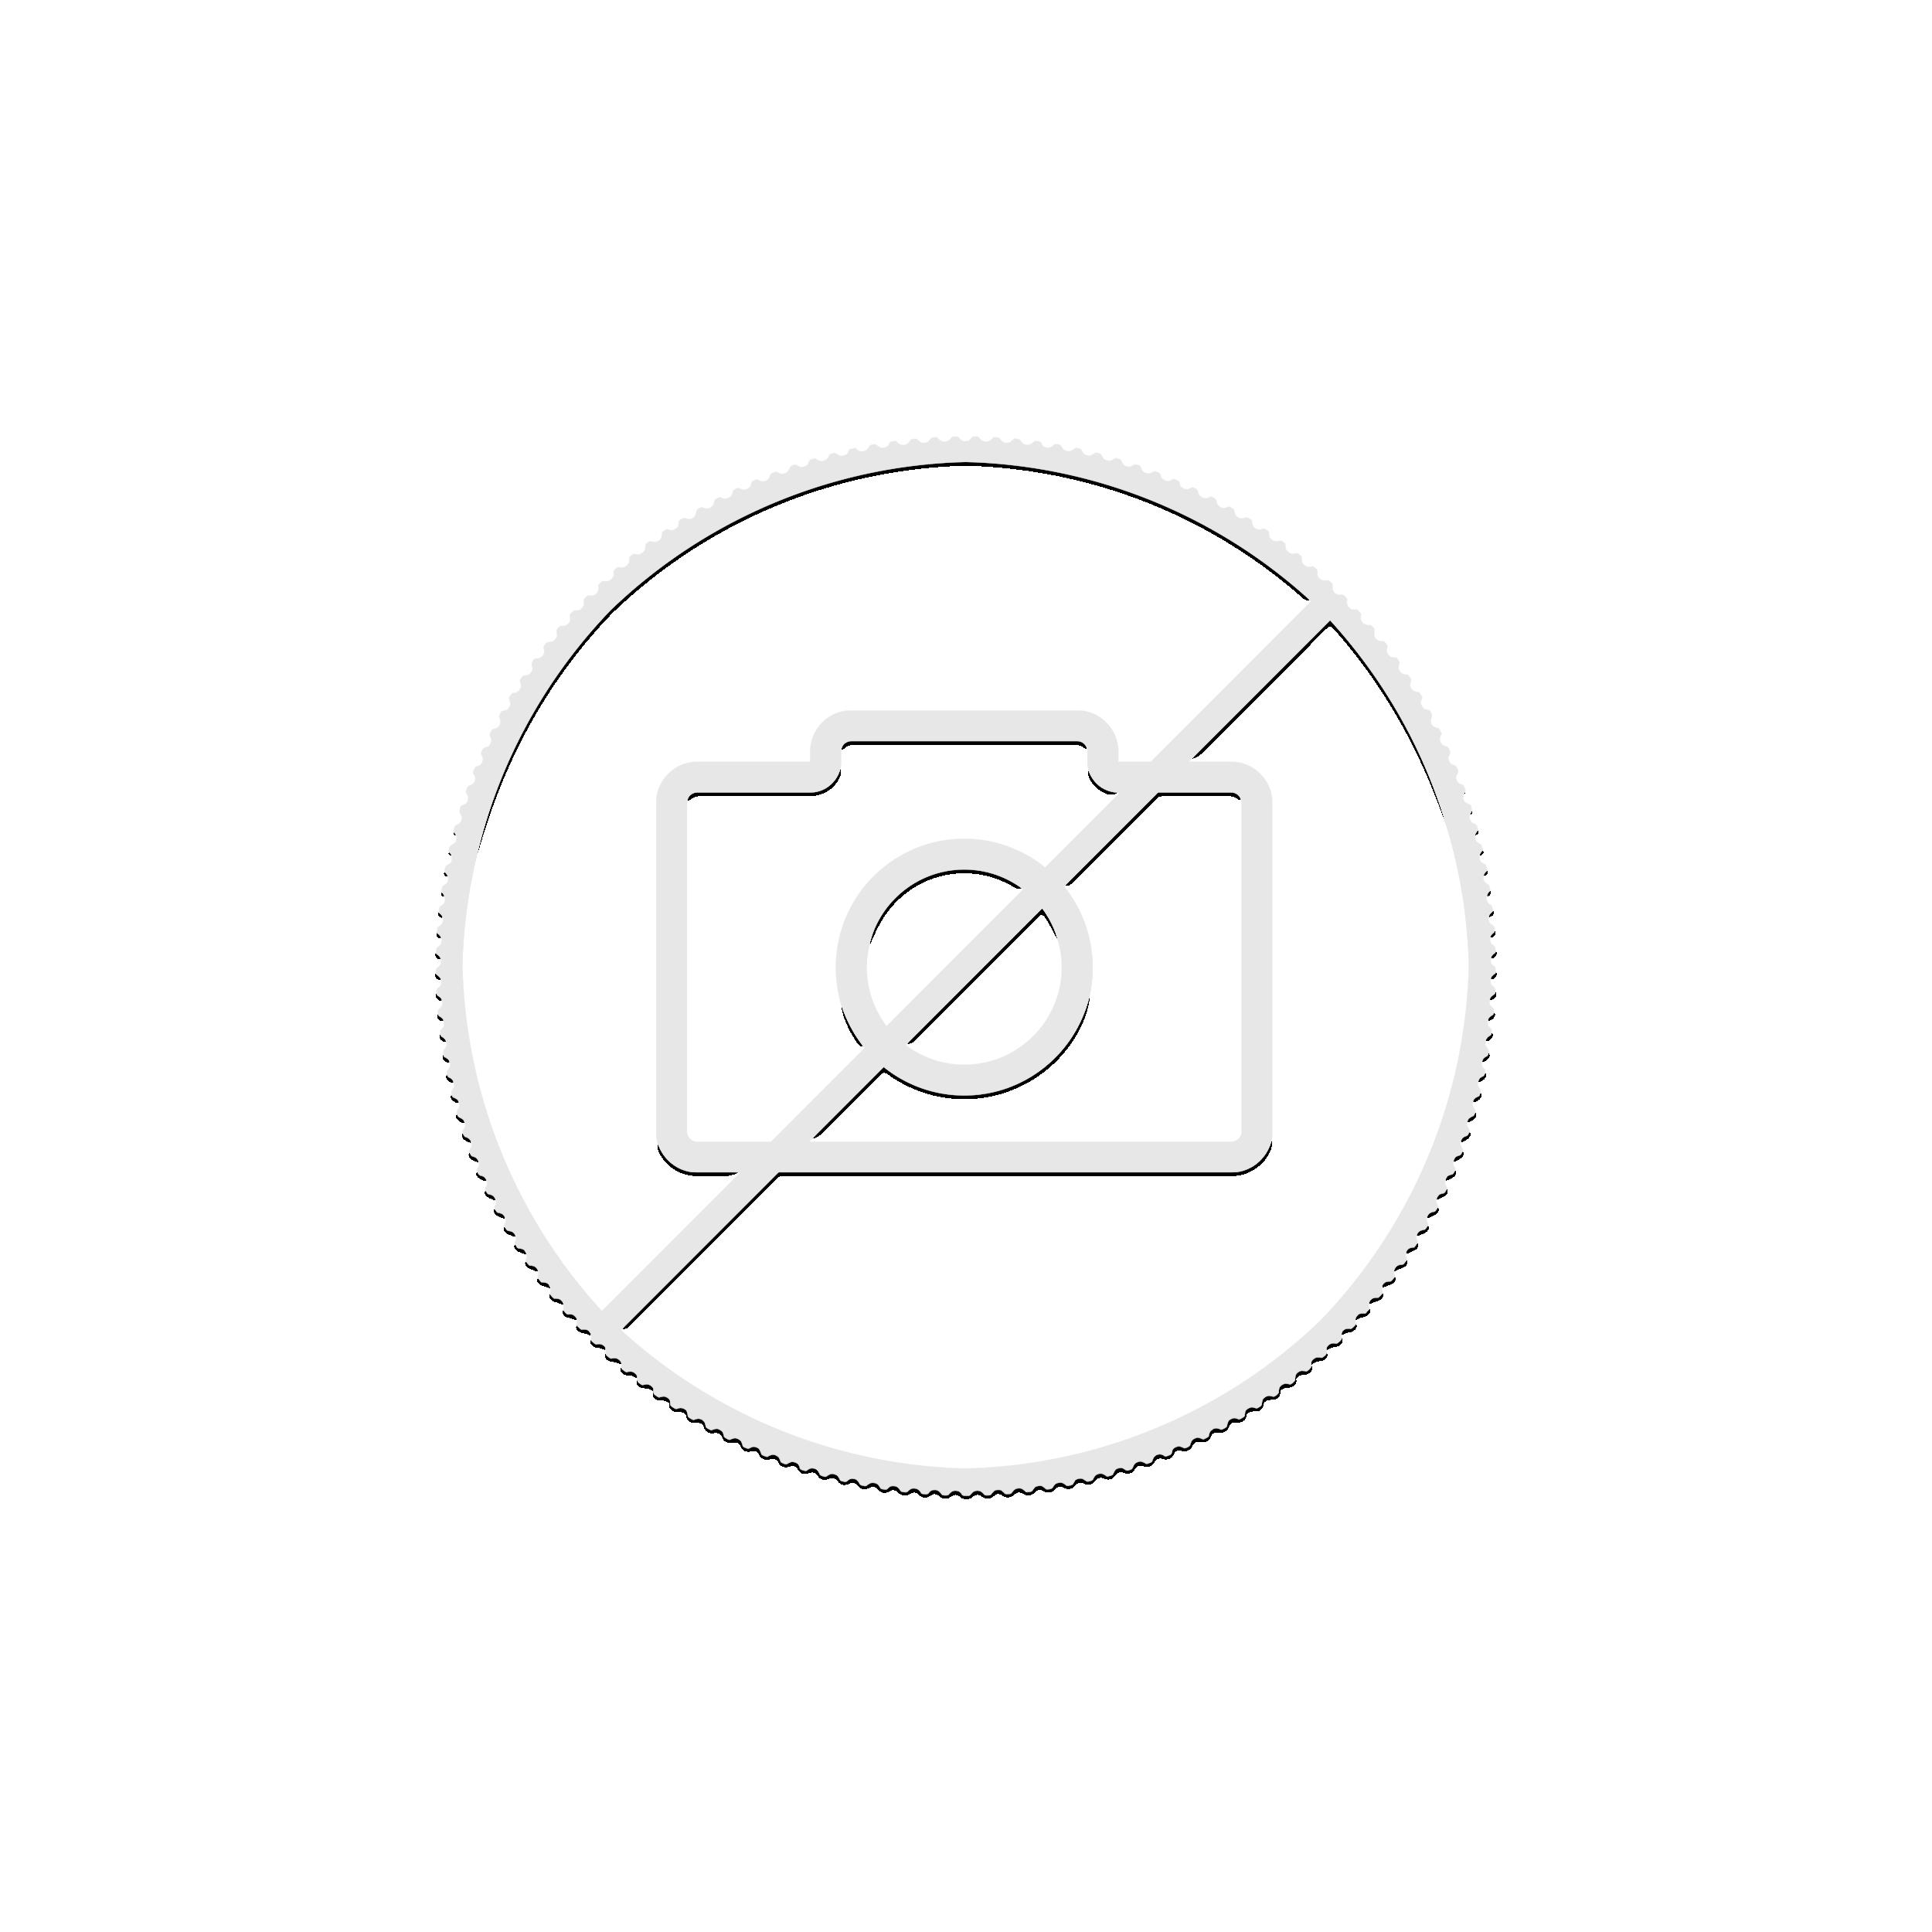 2 troy ounce zilveren munt Samoa Avalokitesvara Piedfort - antieke afwerking 2020